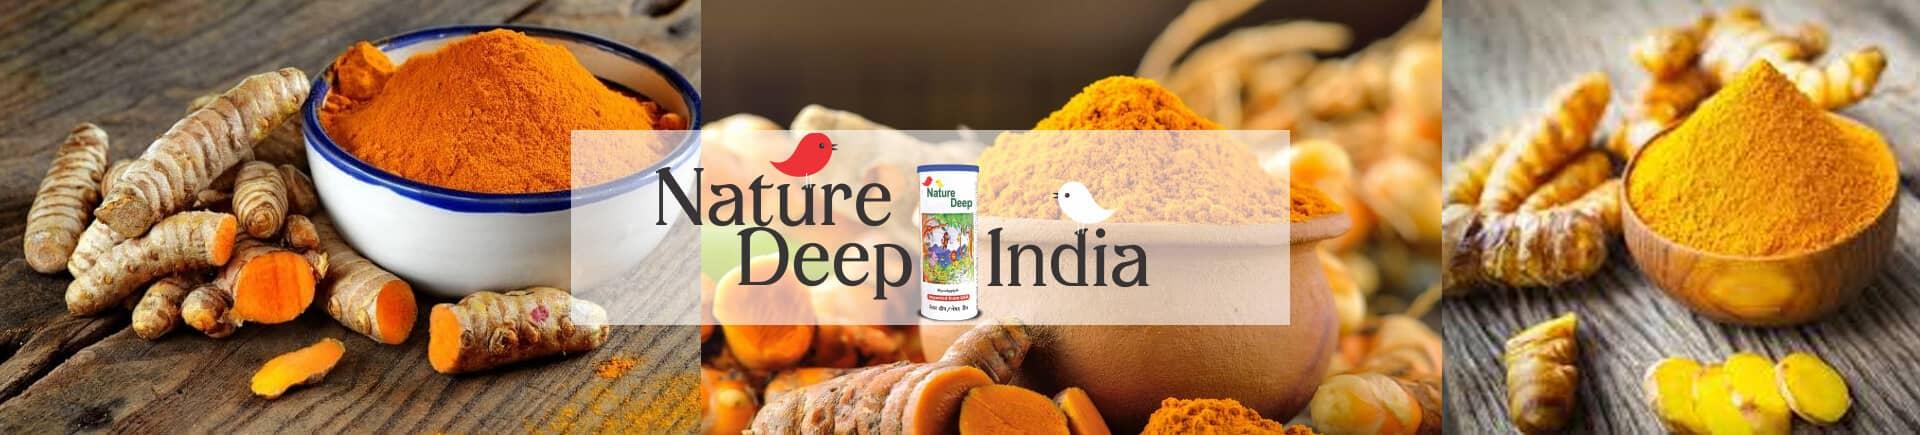 sumitomo naturedeep for turmeric crop desktop banner